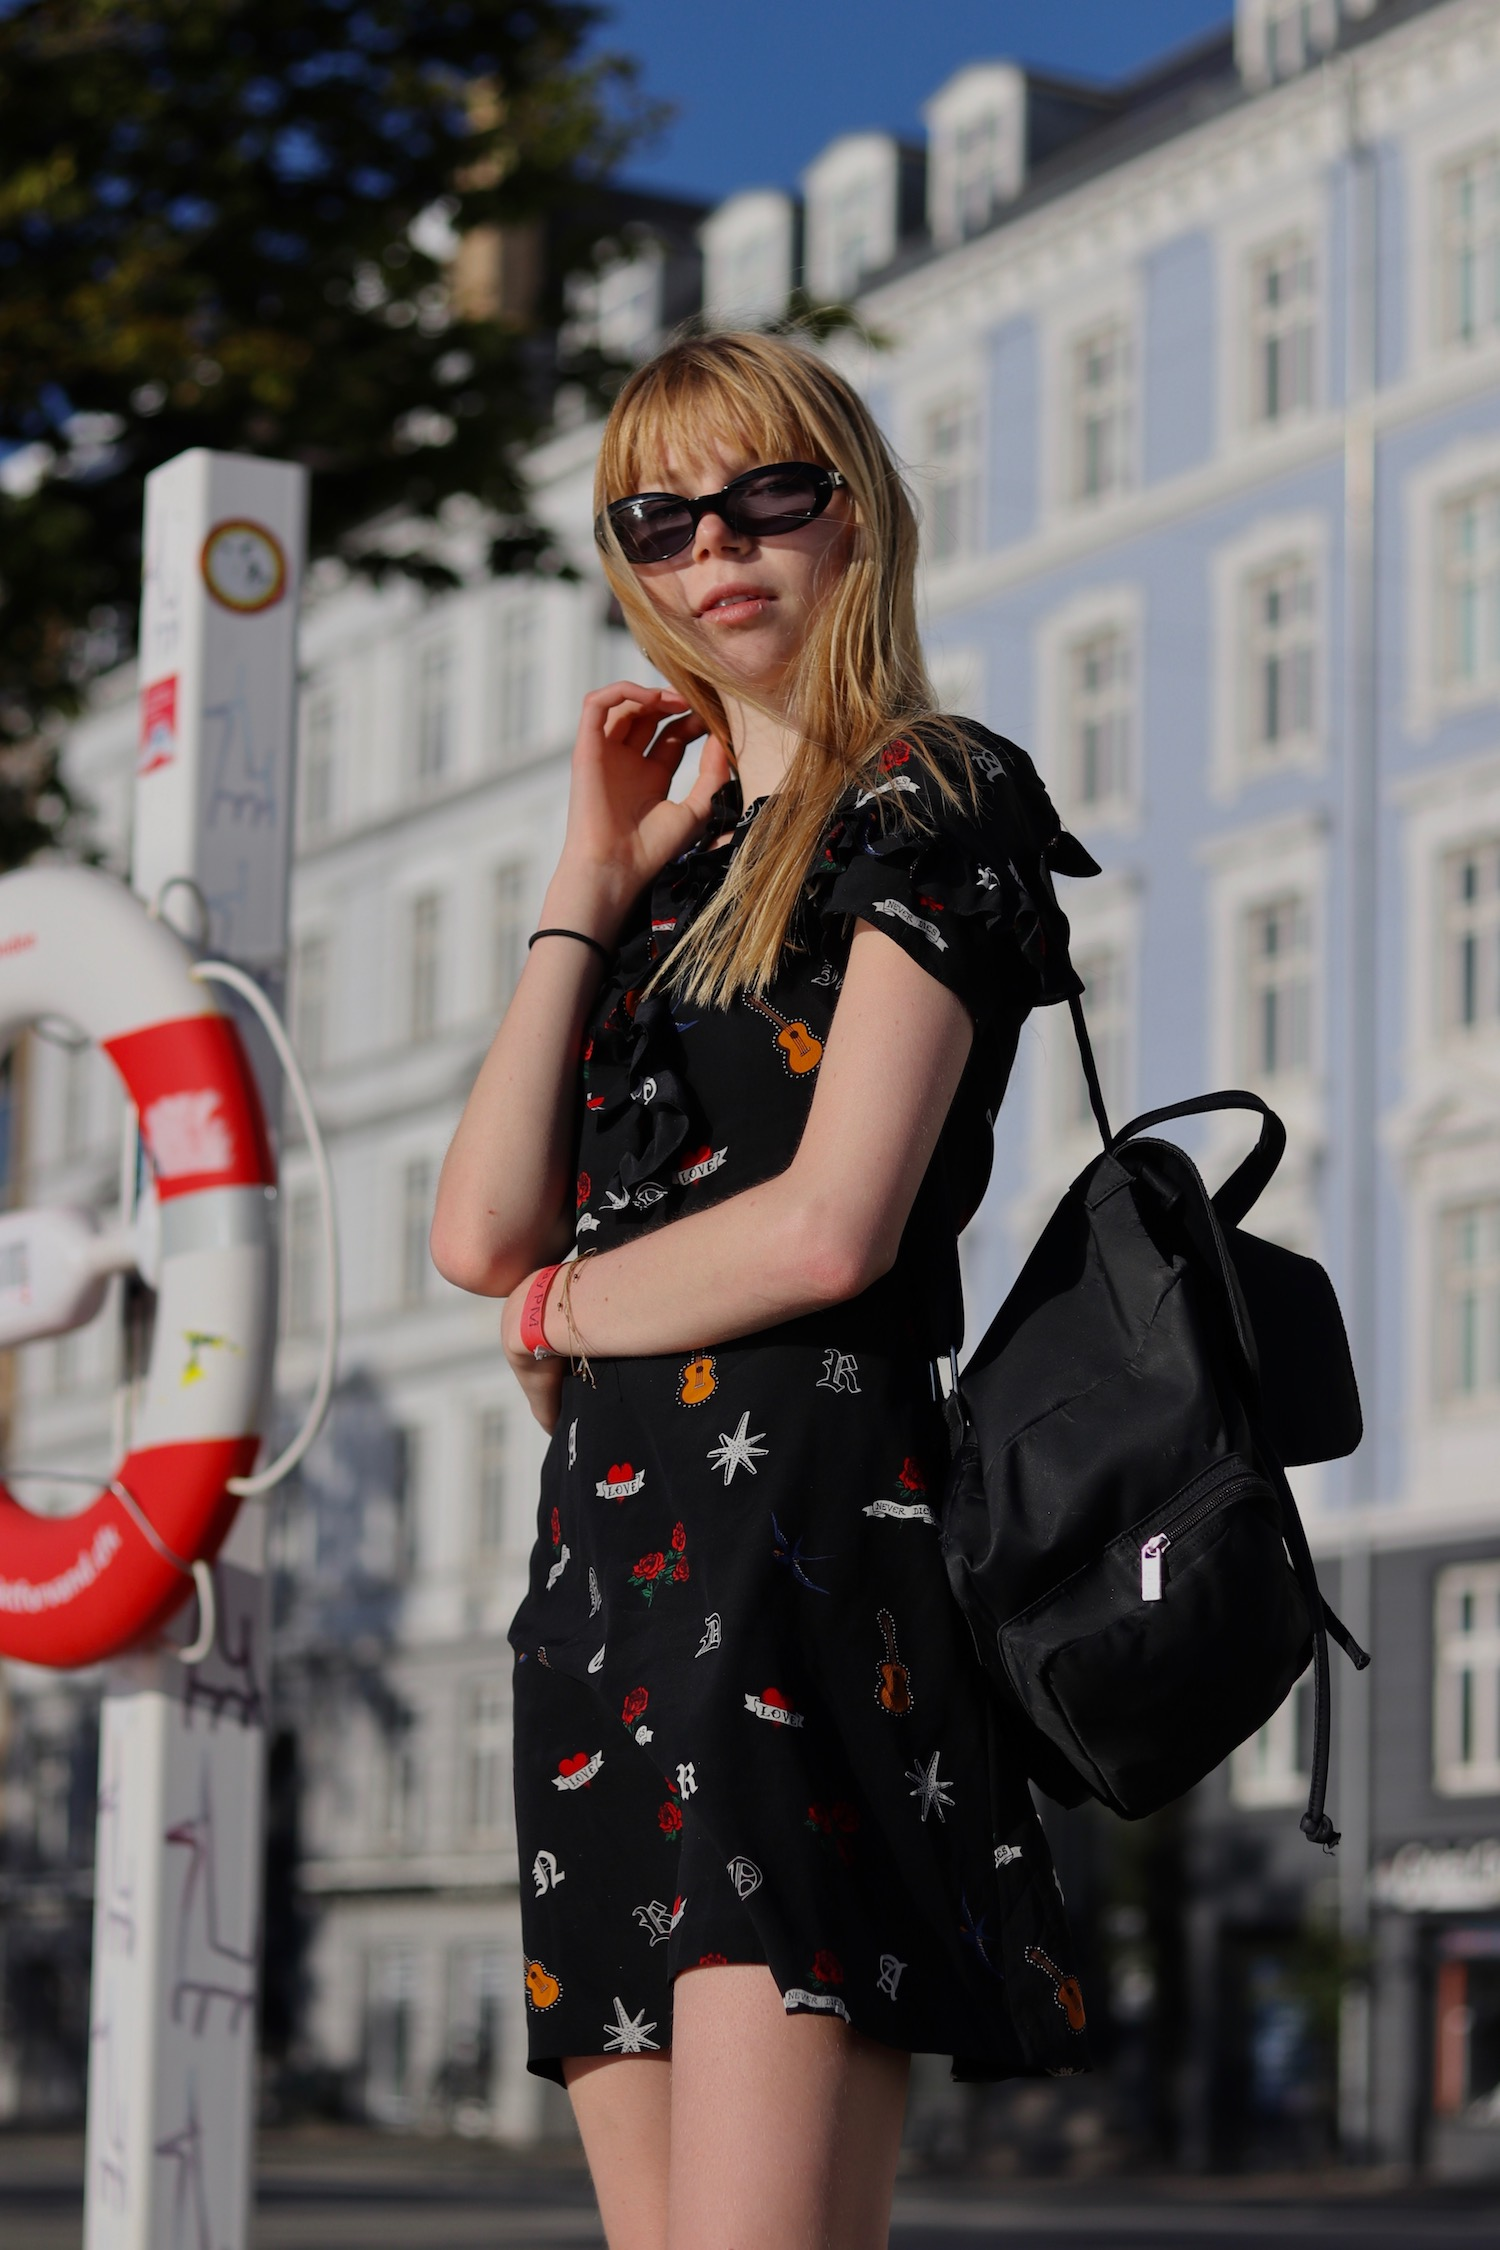 www.bmhardy.com_photogrqphy_womenIMG_1567.jpg